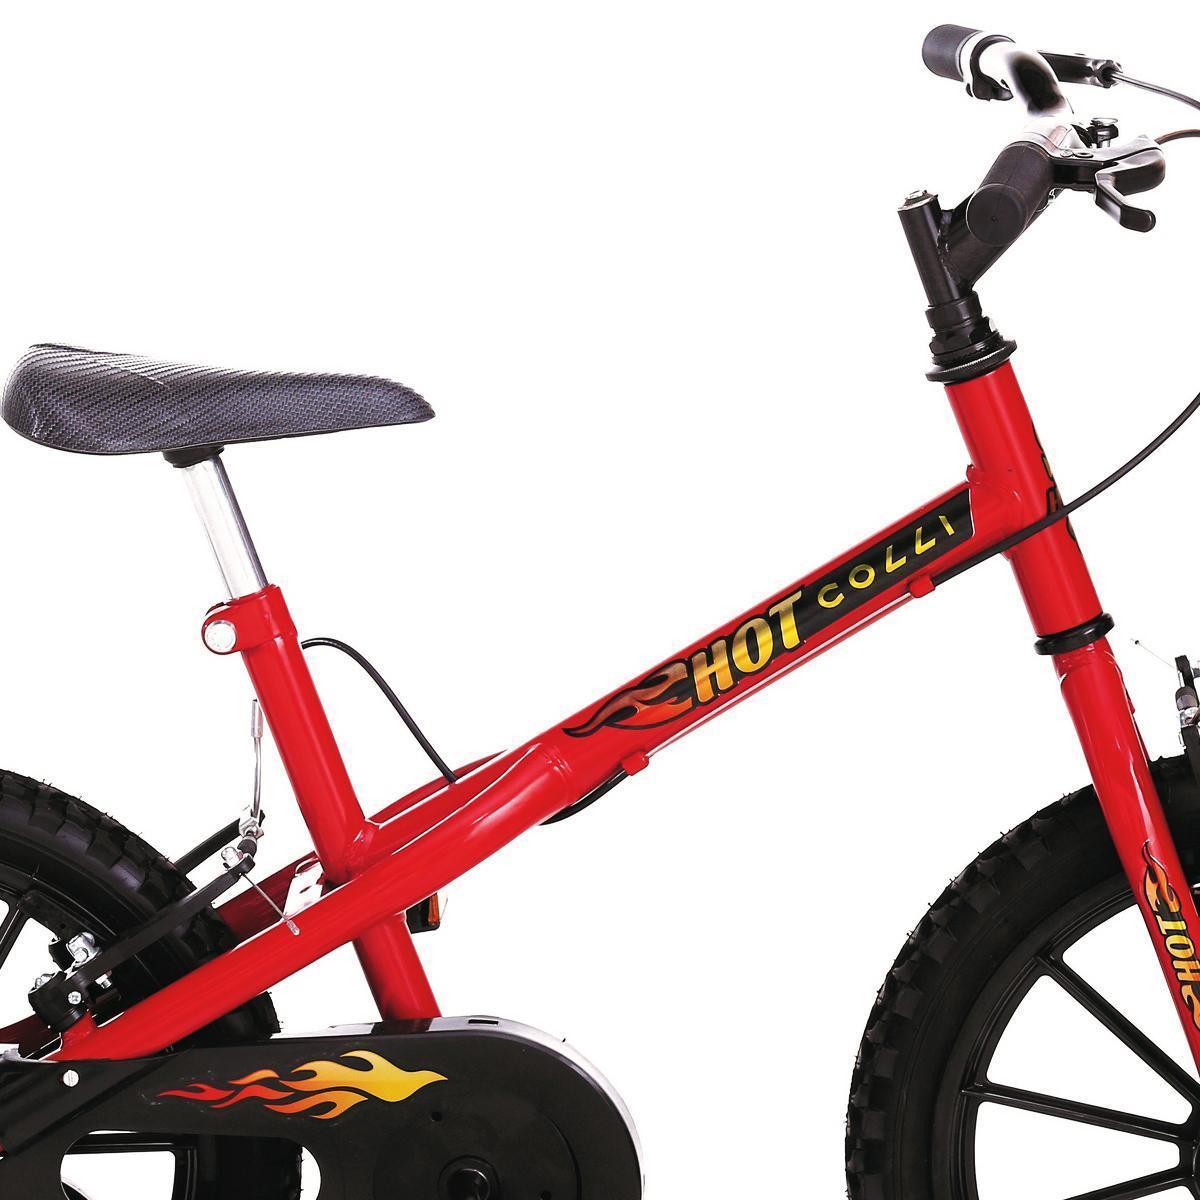 802904306 Bicicleta Colli MTB Hot Aro 16 Masculino - 112.16D - Bicicleta ...